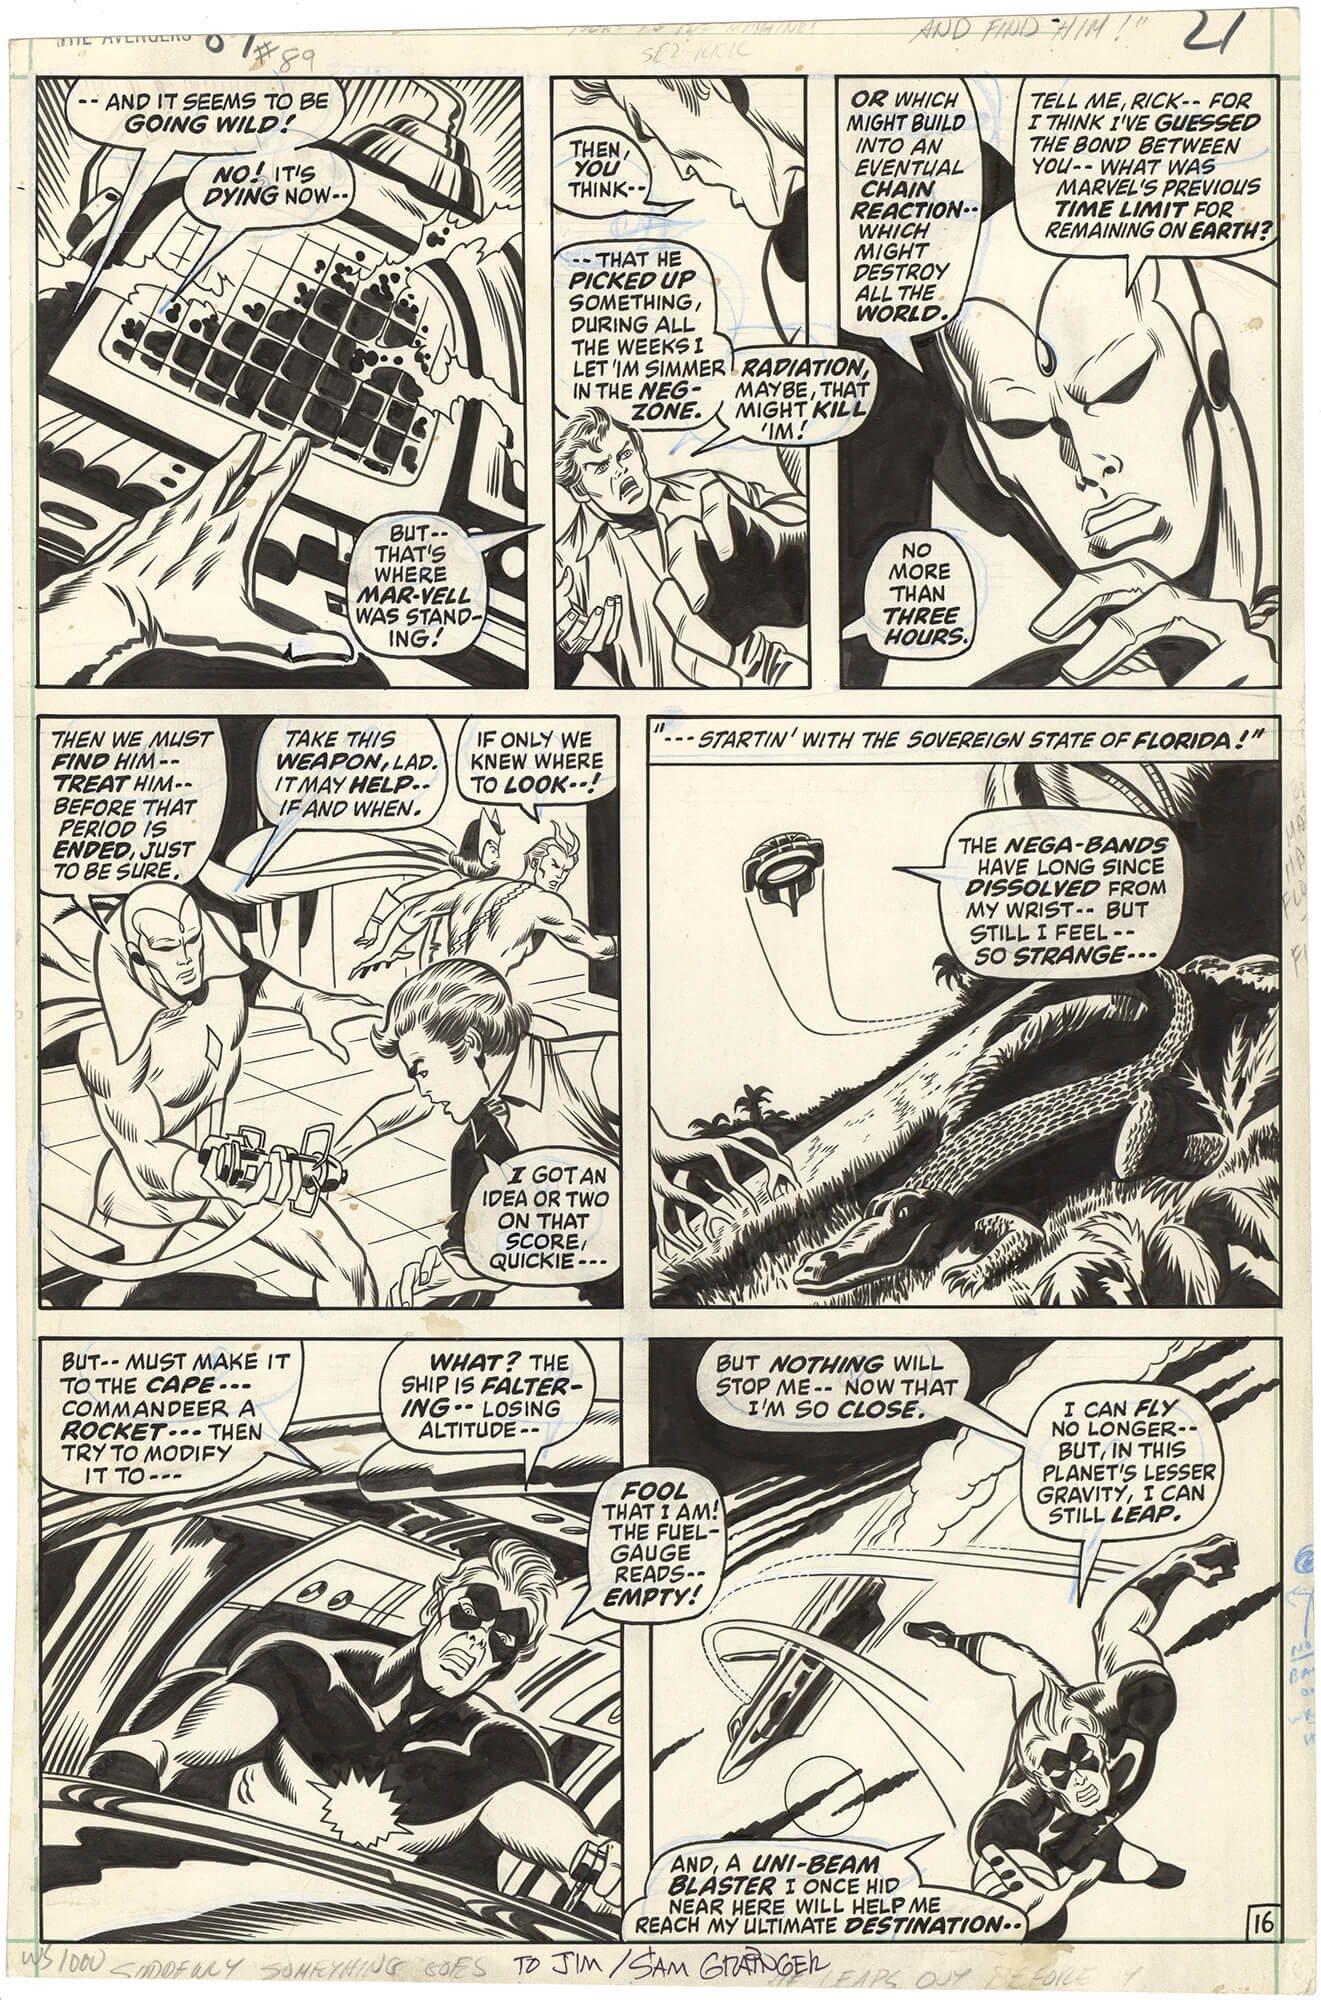 Avengers #89 p16